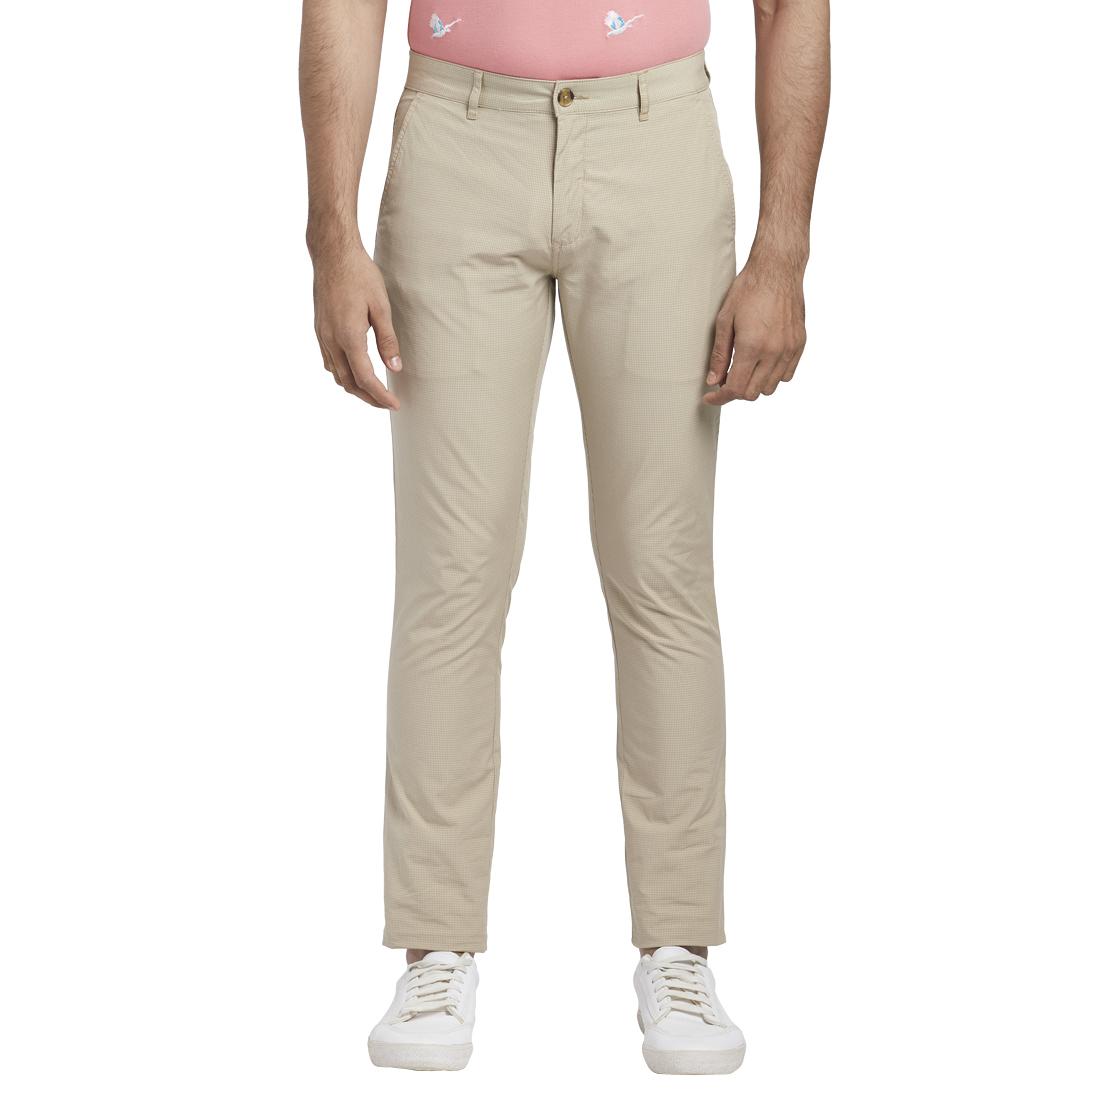 ColorPlus   ColorPlus Beige Trouser